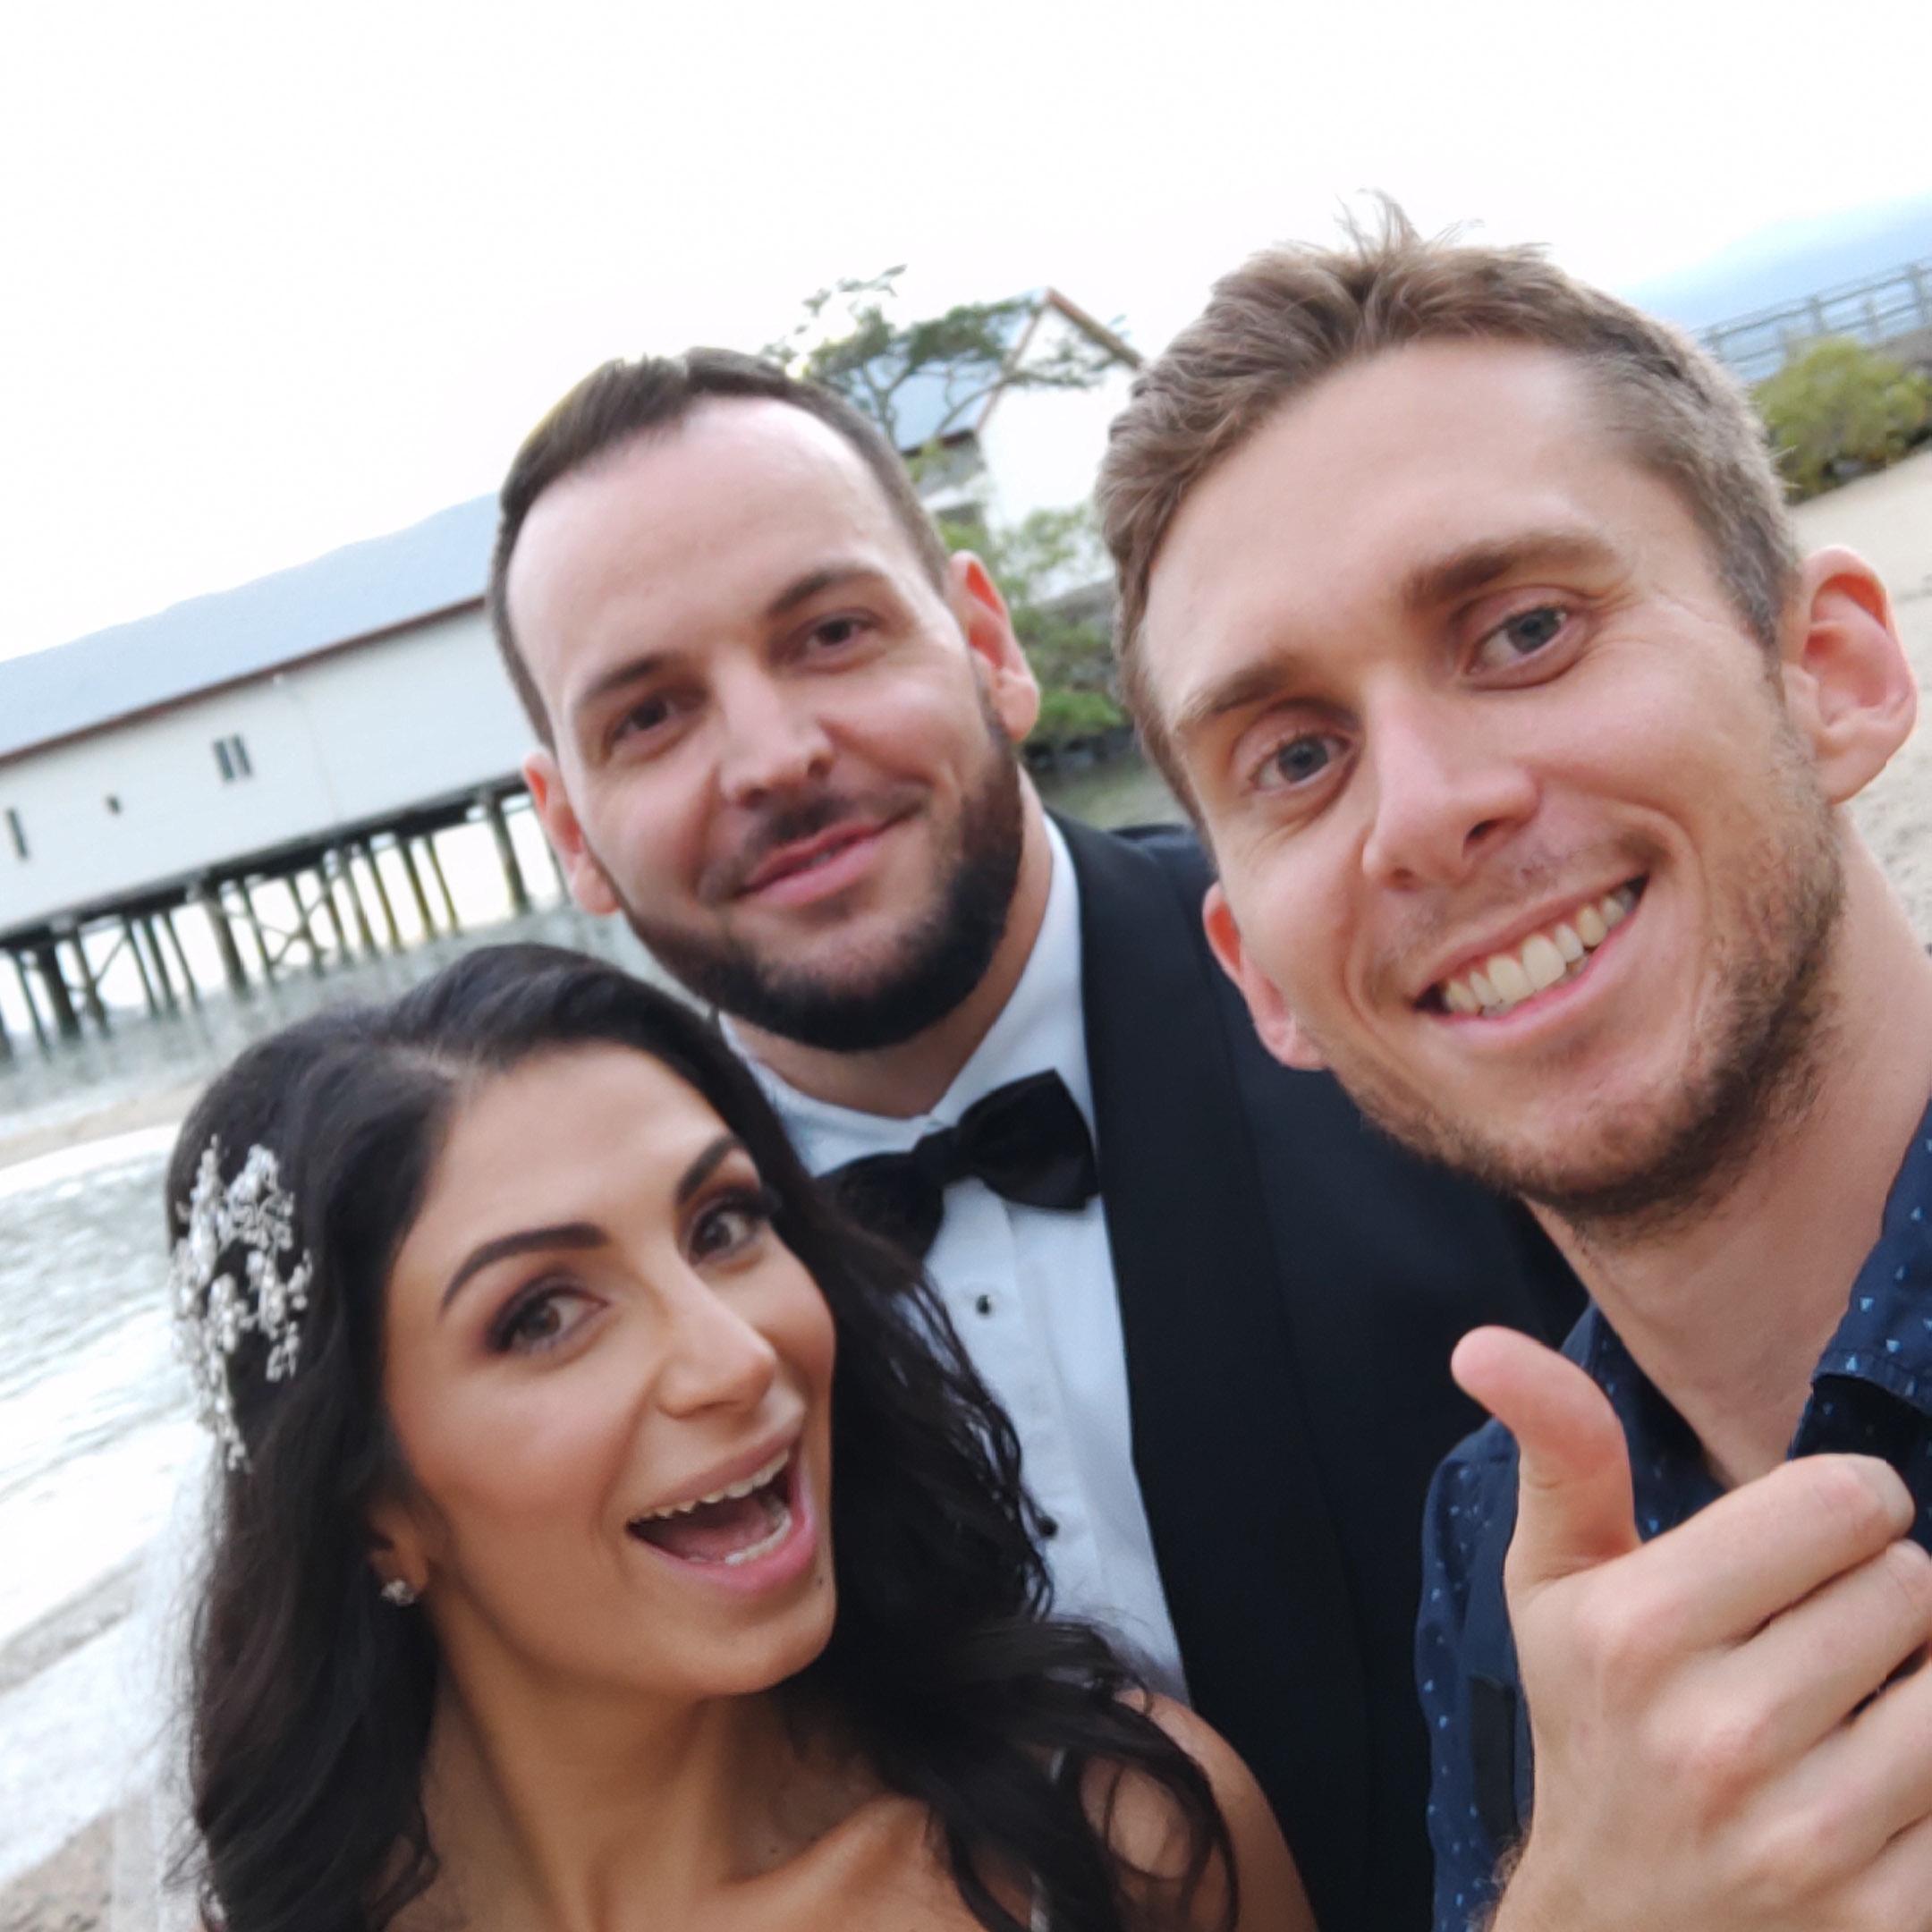 The-raw-photographer-cairns-wedding-photography-bridalparty-selfie-13.jpg